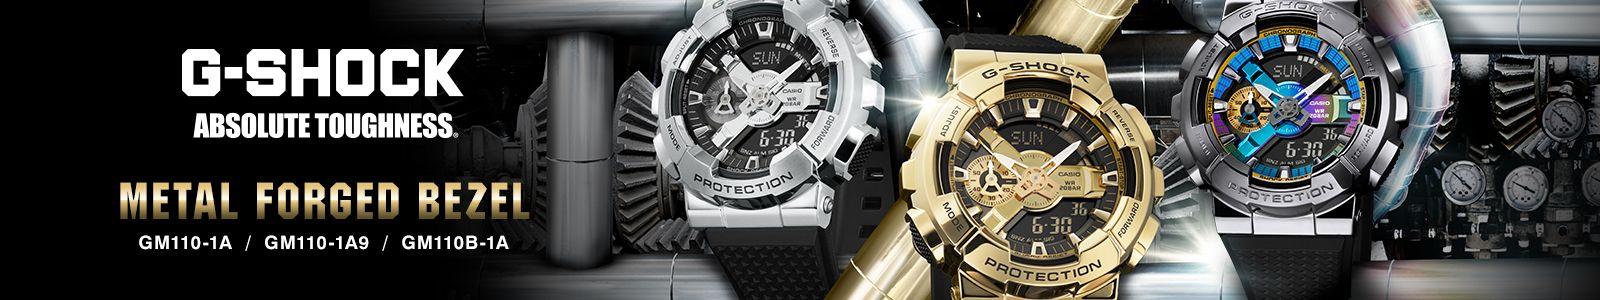 G-Shock, Absolute Toughness, Metal Forged Bezel, GM110-1A / GM110-1A9 / GM110B-1A